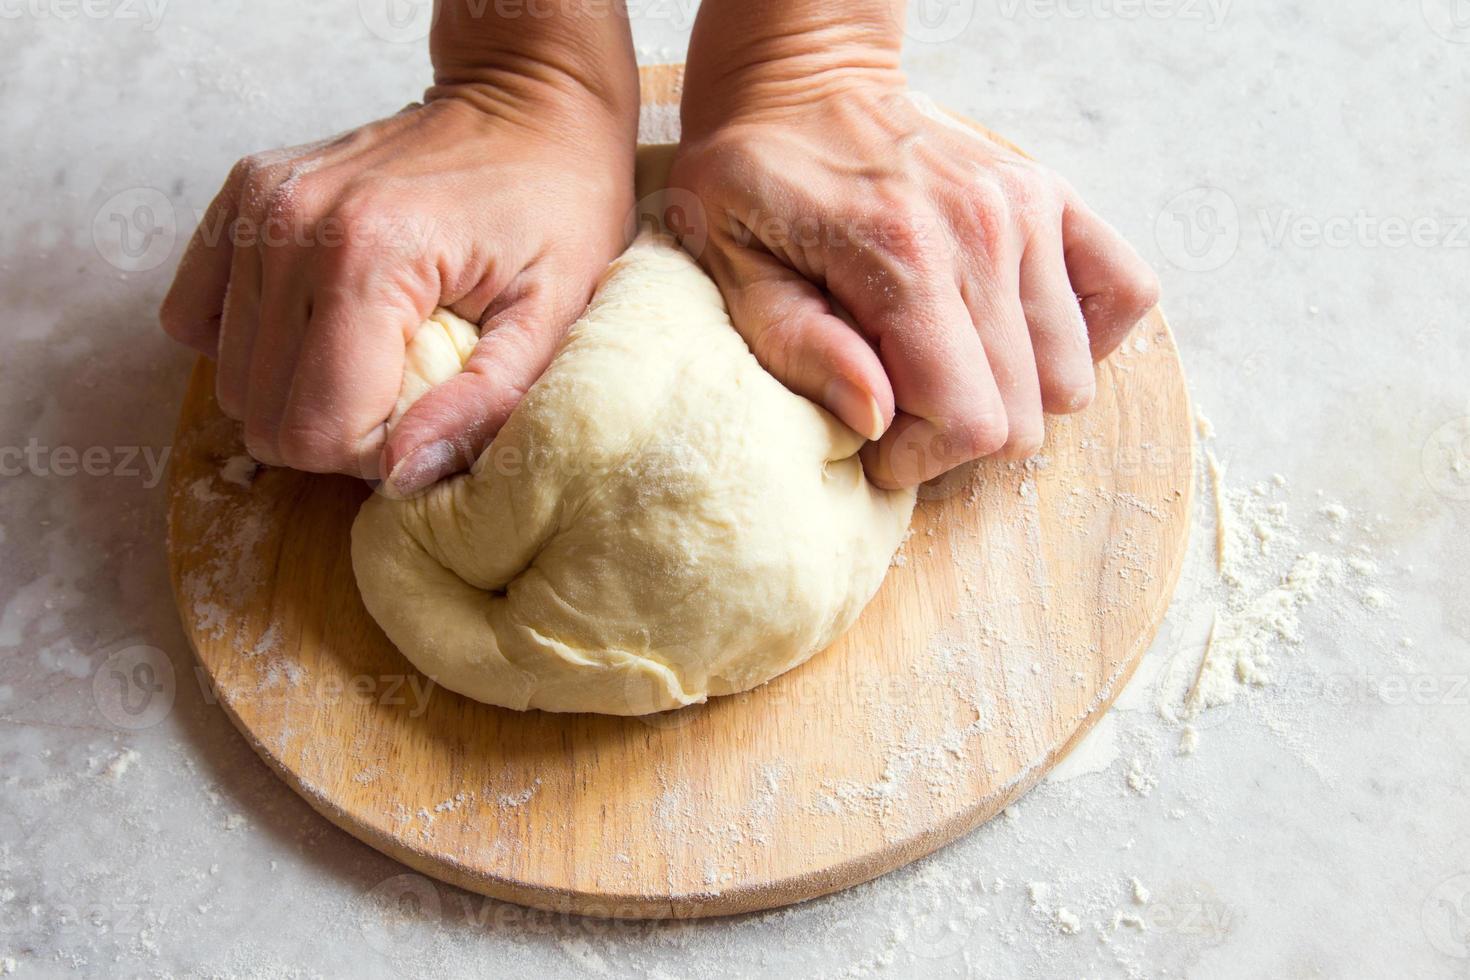 Hands knead dough photo